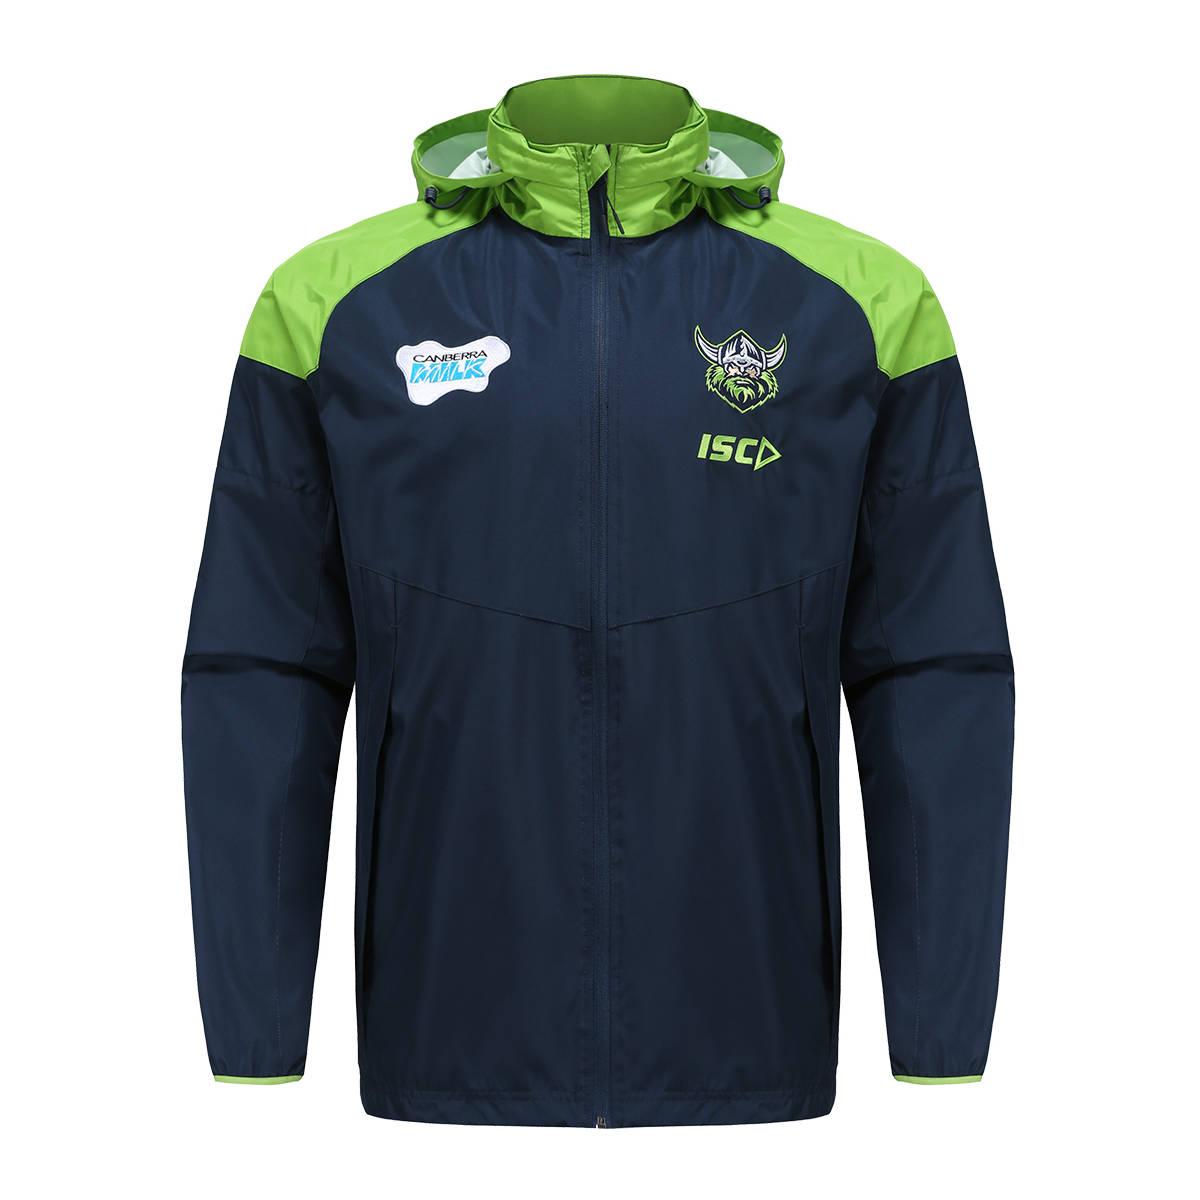 2021 Adults Wet Weather Jacket0